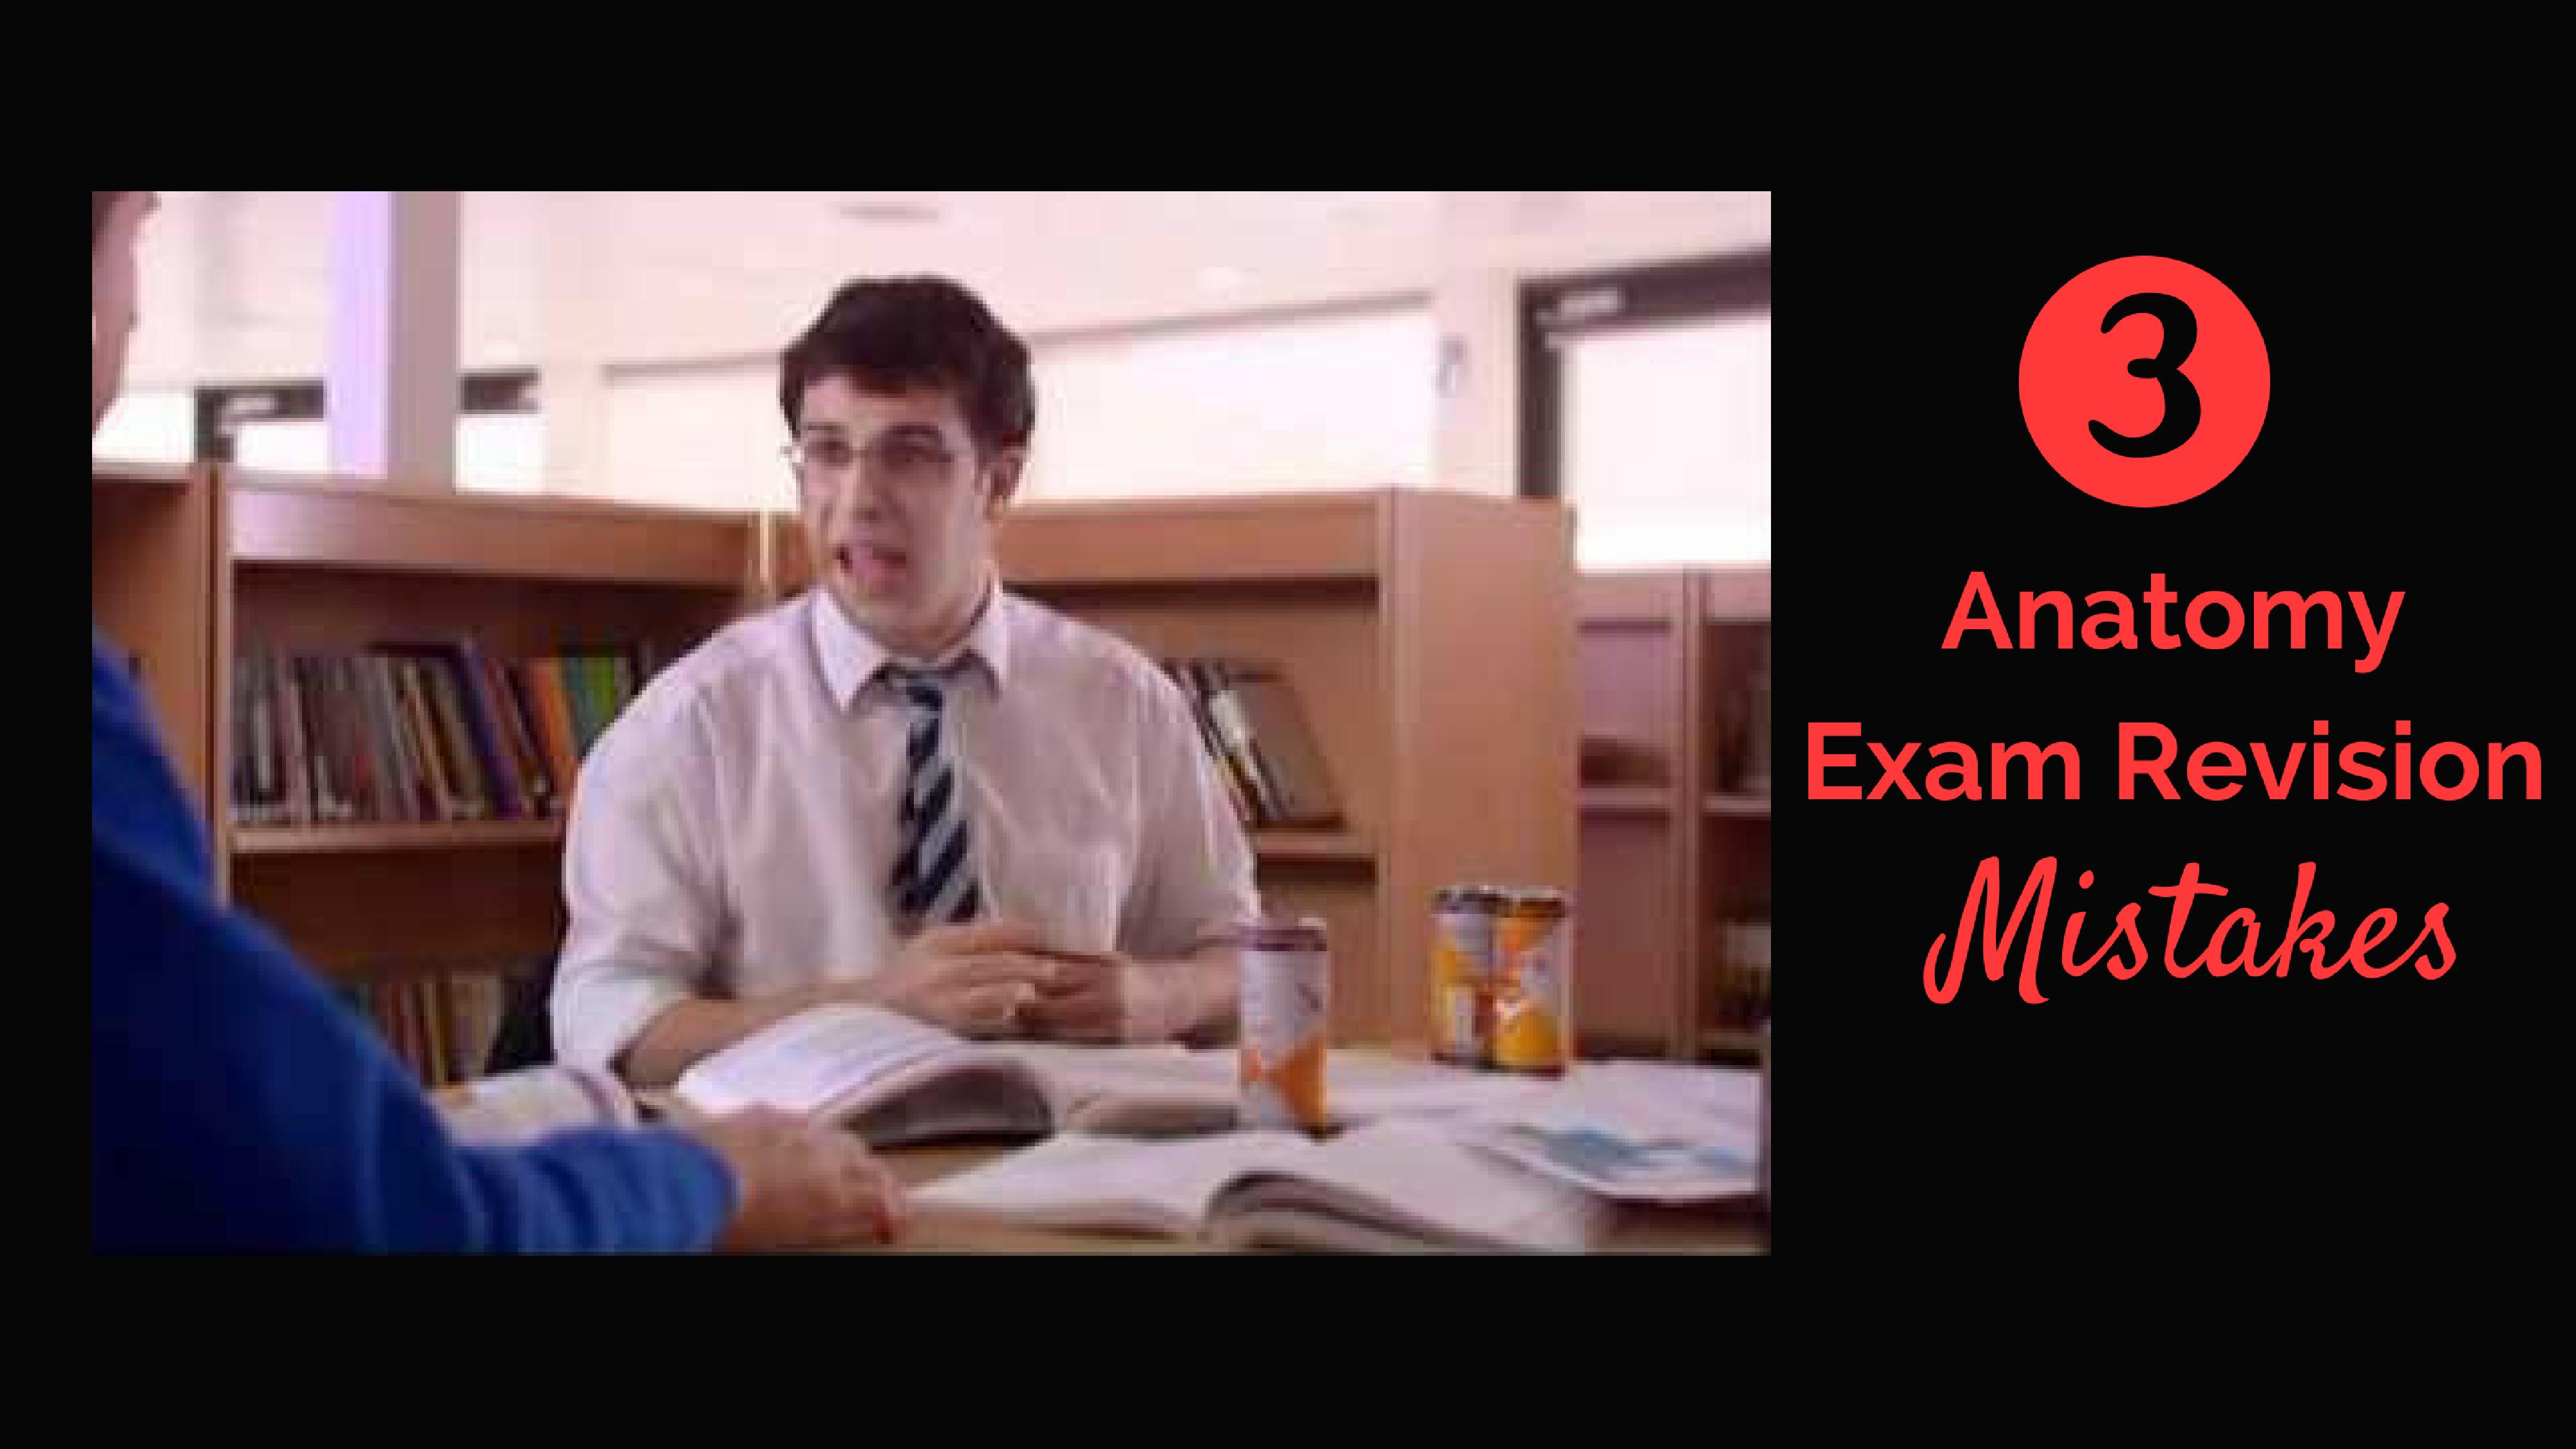 3 Anatomy Exam Revision Mistakes